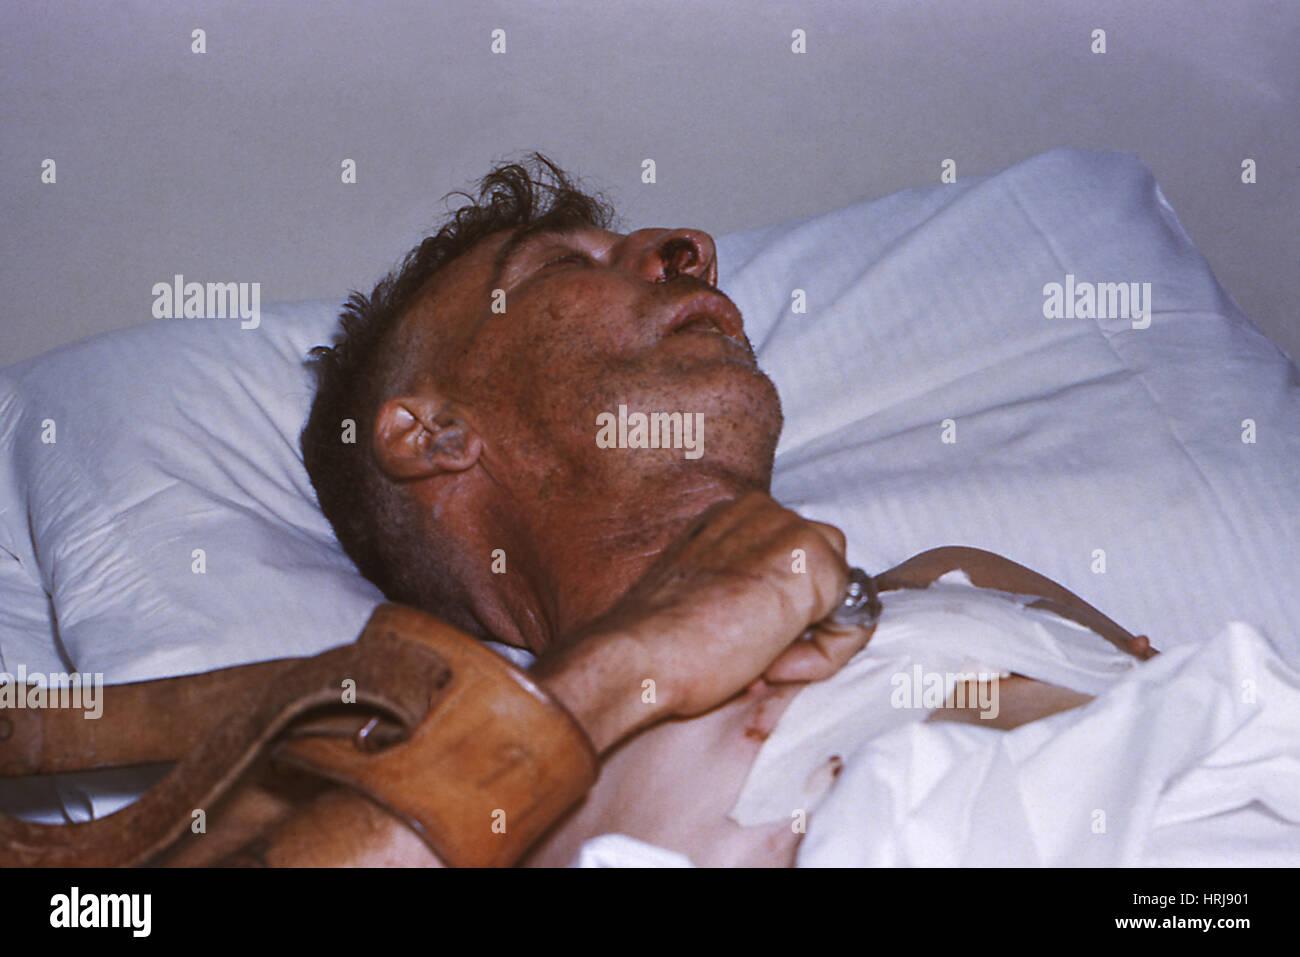 Hospitalized Rabies Victim, 1958 - Stock Image